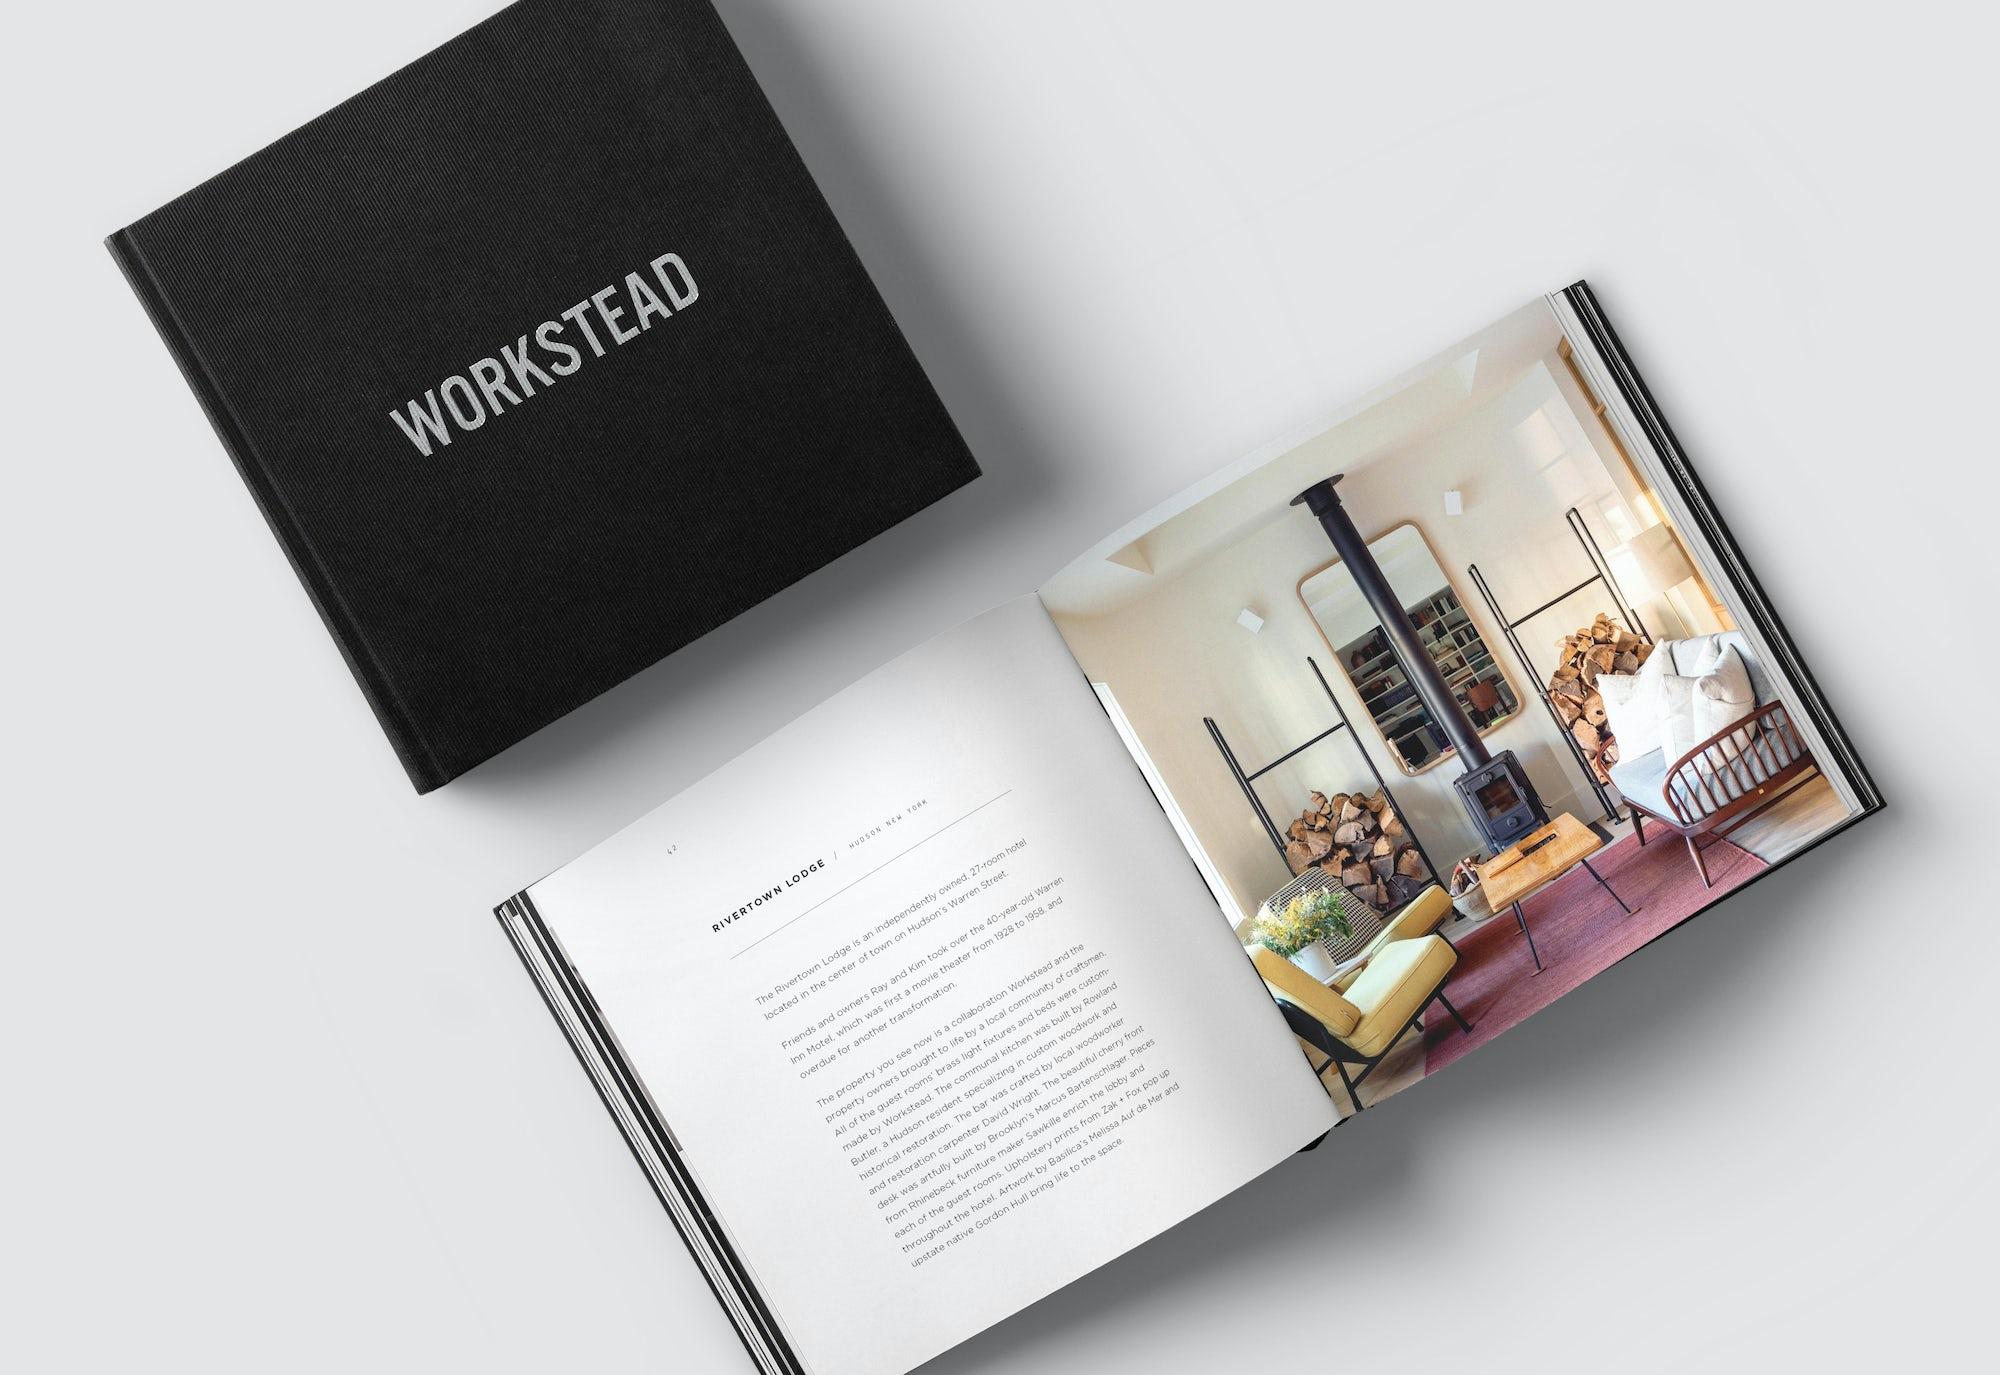 Workstead Architecture Firm Graphic Design